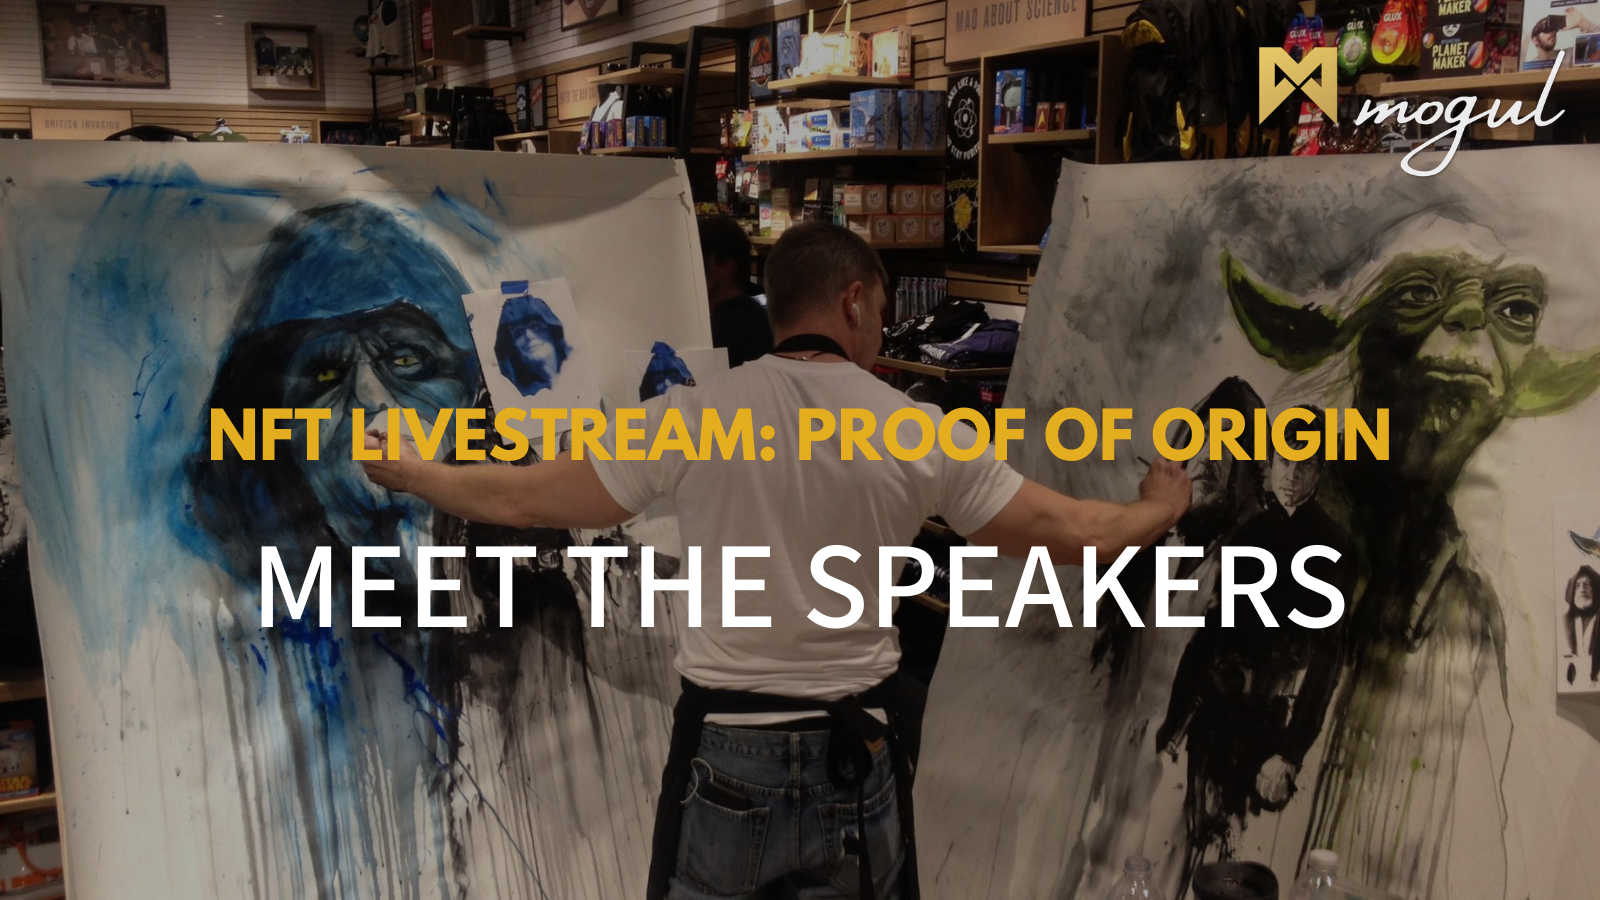 NFT Livestream Proof of Origin - The Speakers!